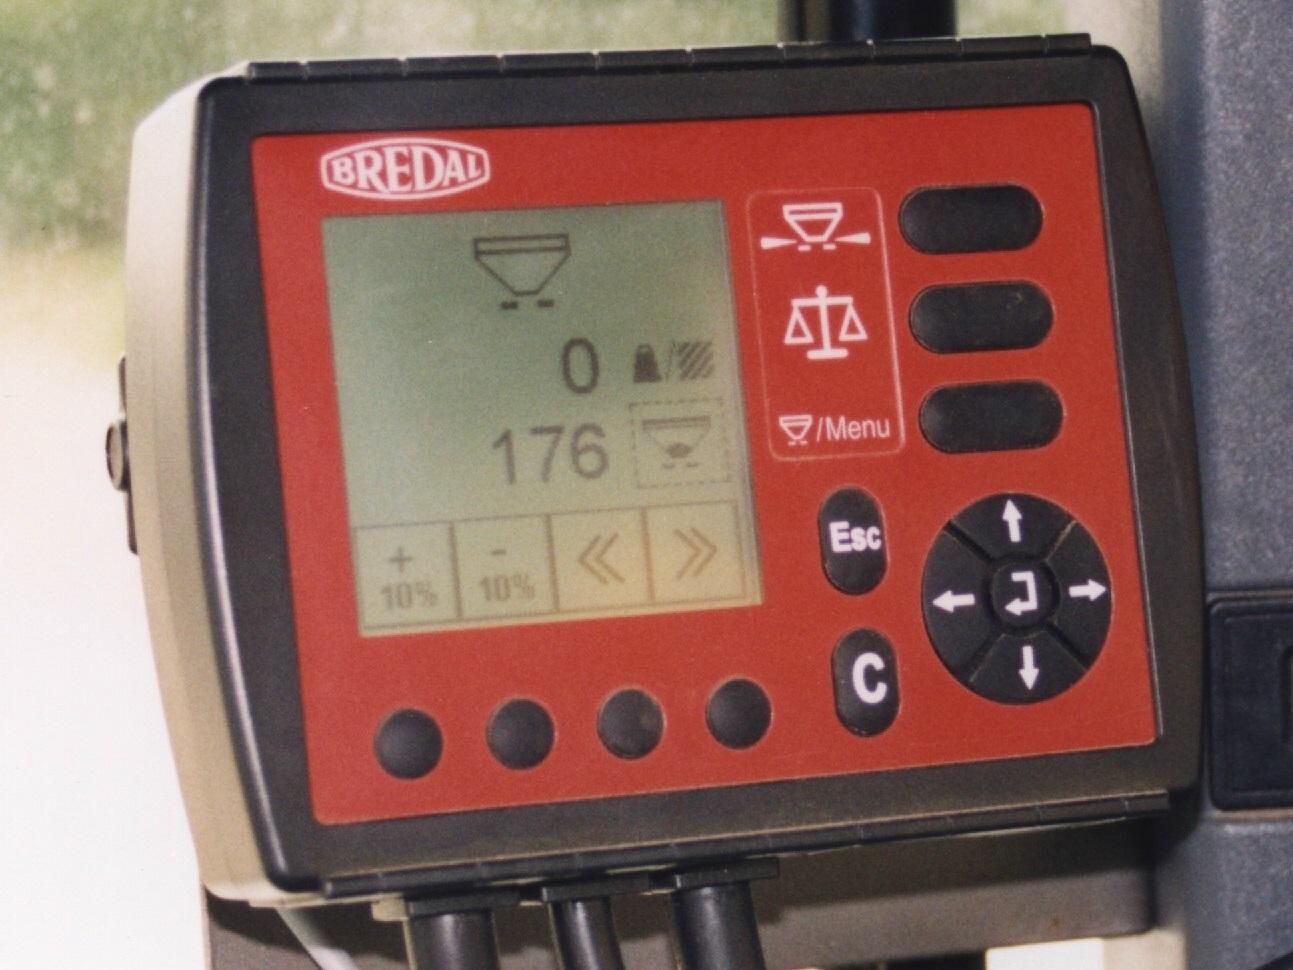 Boitier de contrôle TeeJet 500